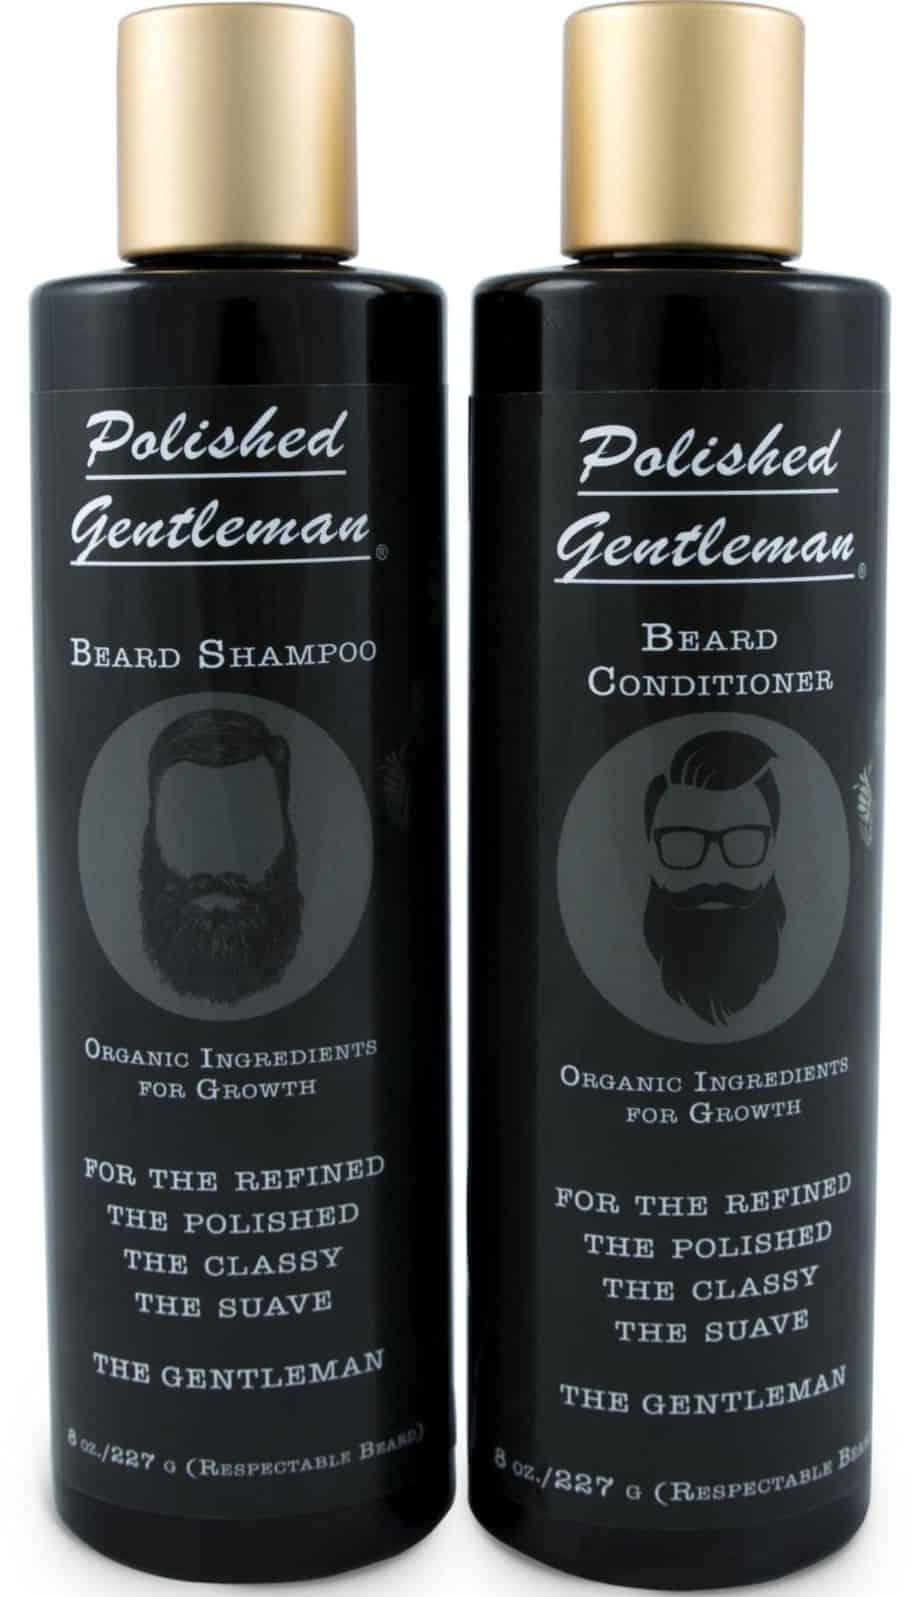 Polished Gentleman Conditioner